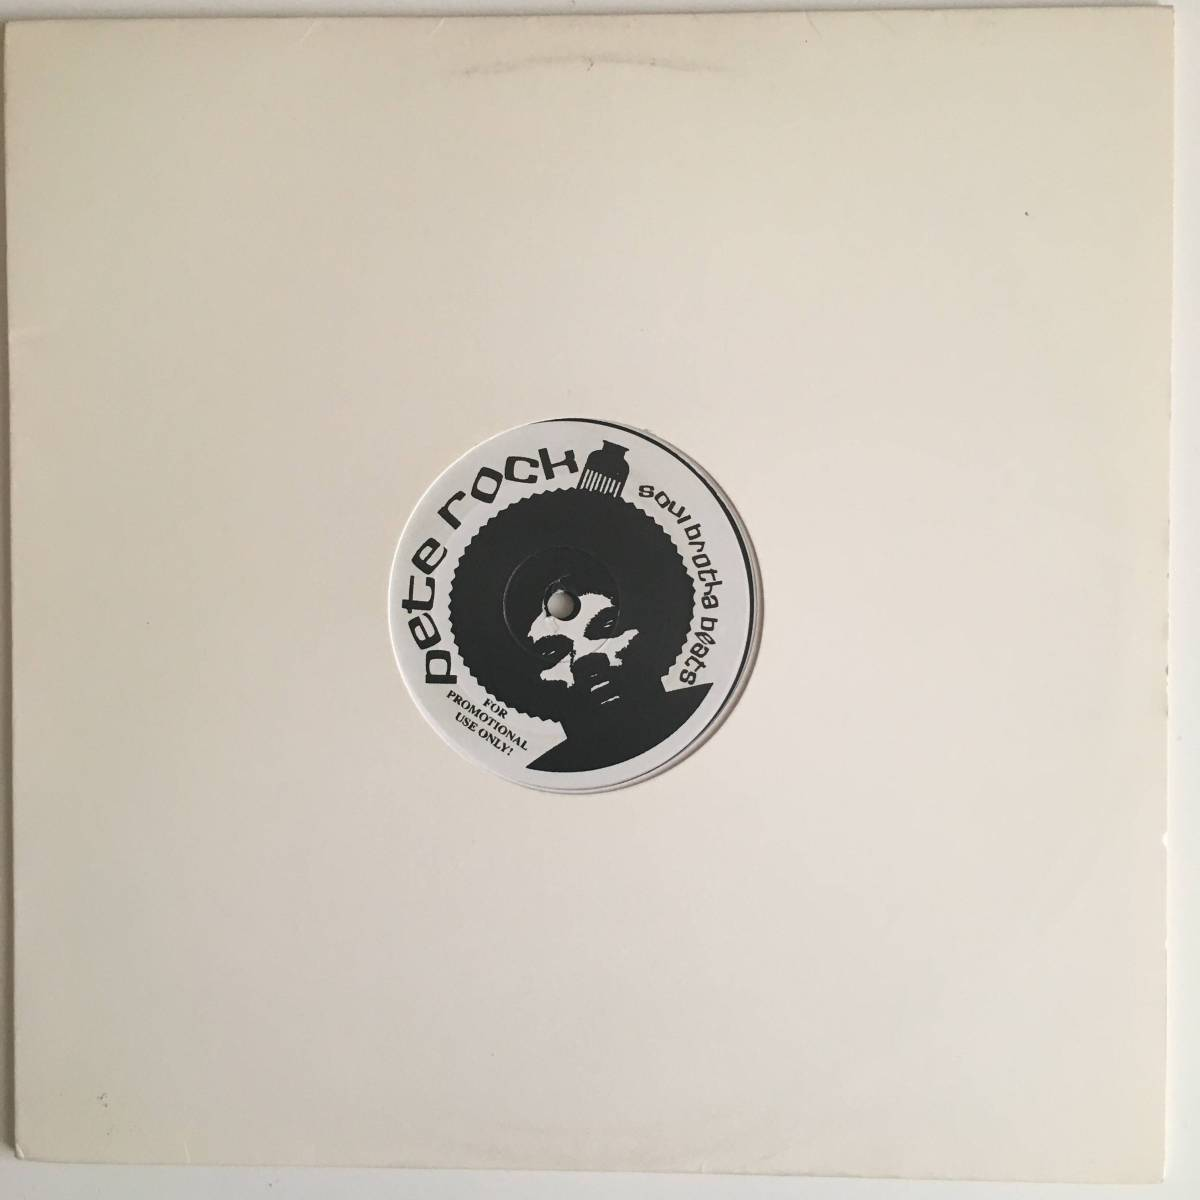 ●Pete Rock/ピートロック/Soul Brotha Beats/1LP/廃盤/レア盤/90's HipHop/Jazzy/DJ Kiyo_画像3